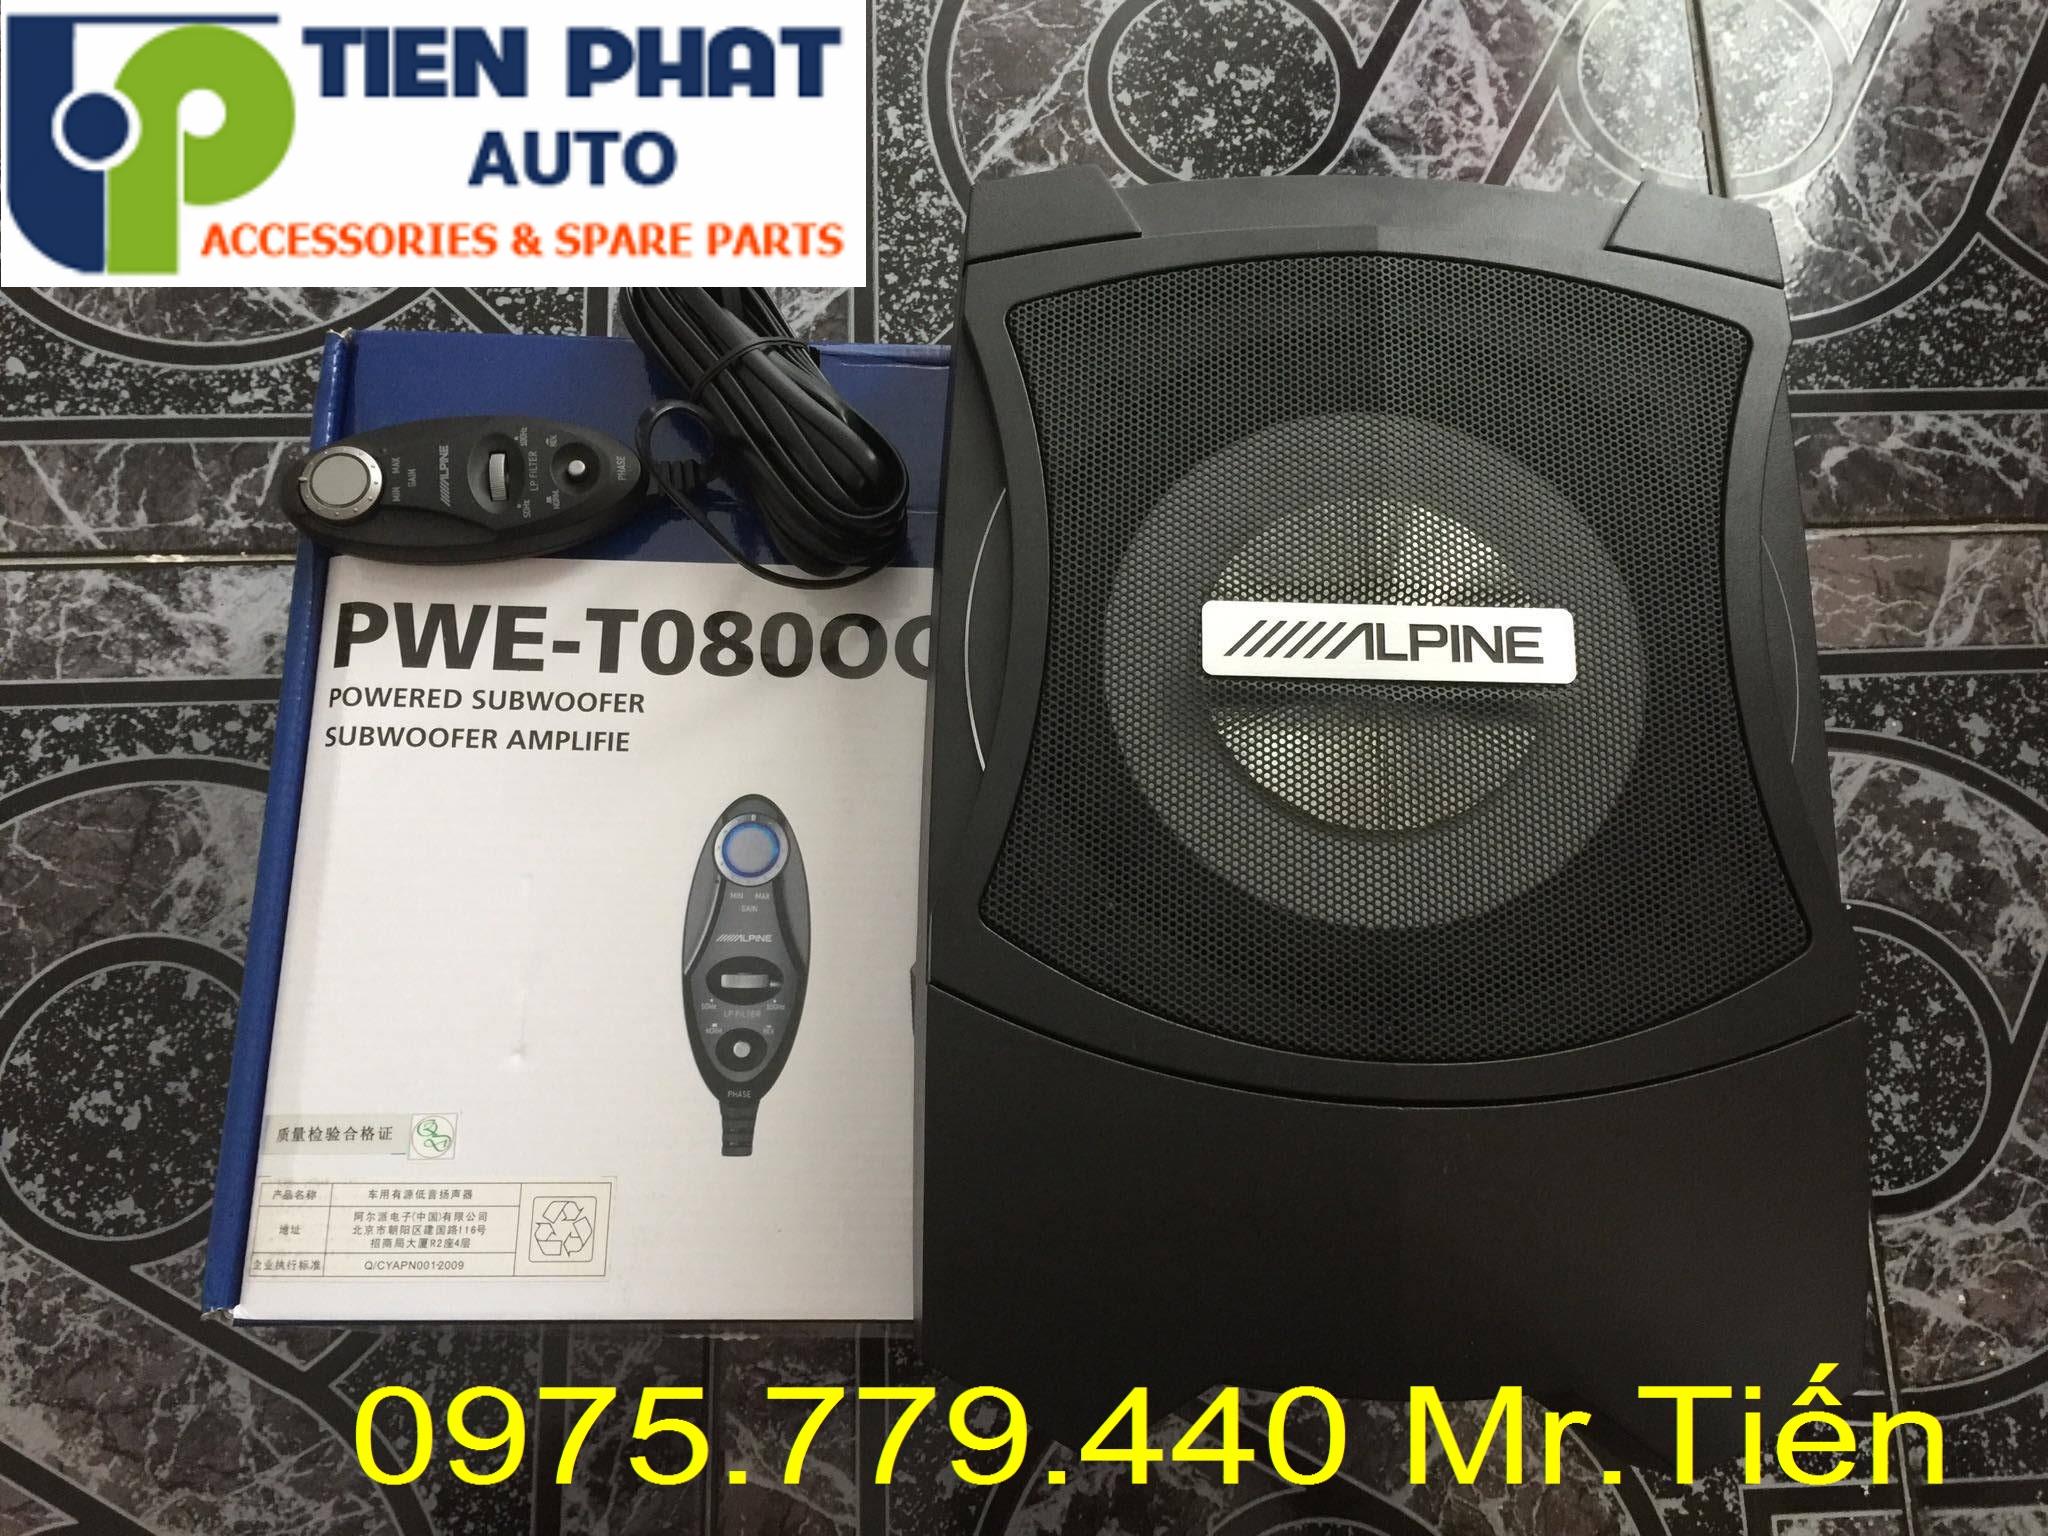 Lắp Loa sub Alpine PWE-T0800C cho Ford Mondeo Lắp Đặt Tận Nơi